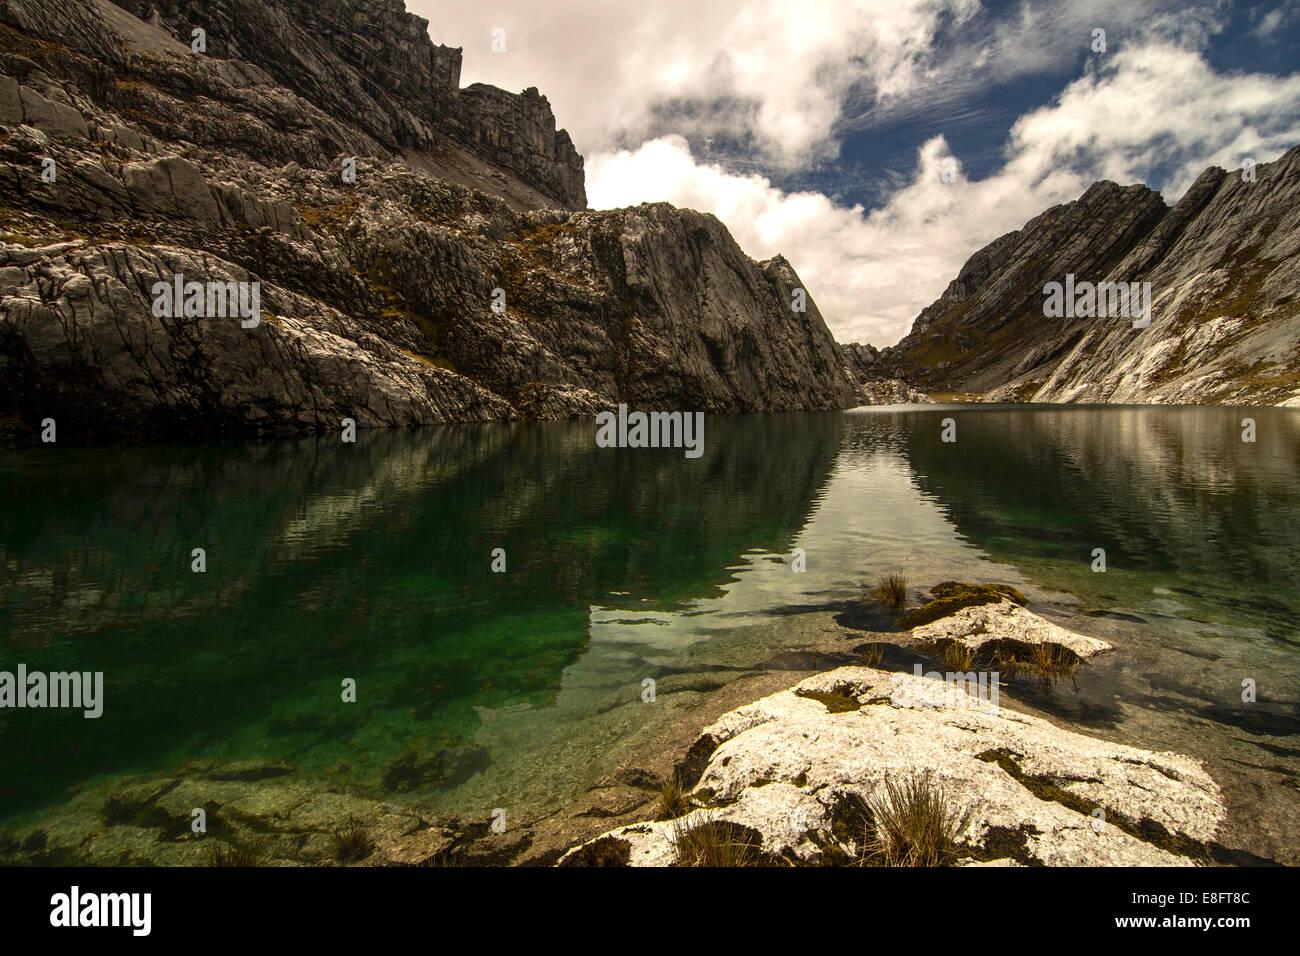 Indonesia, Papua, Idenberg, View of Green Lake - Stock Image